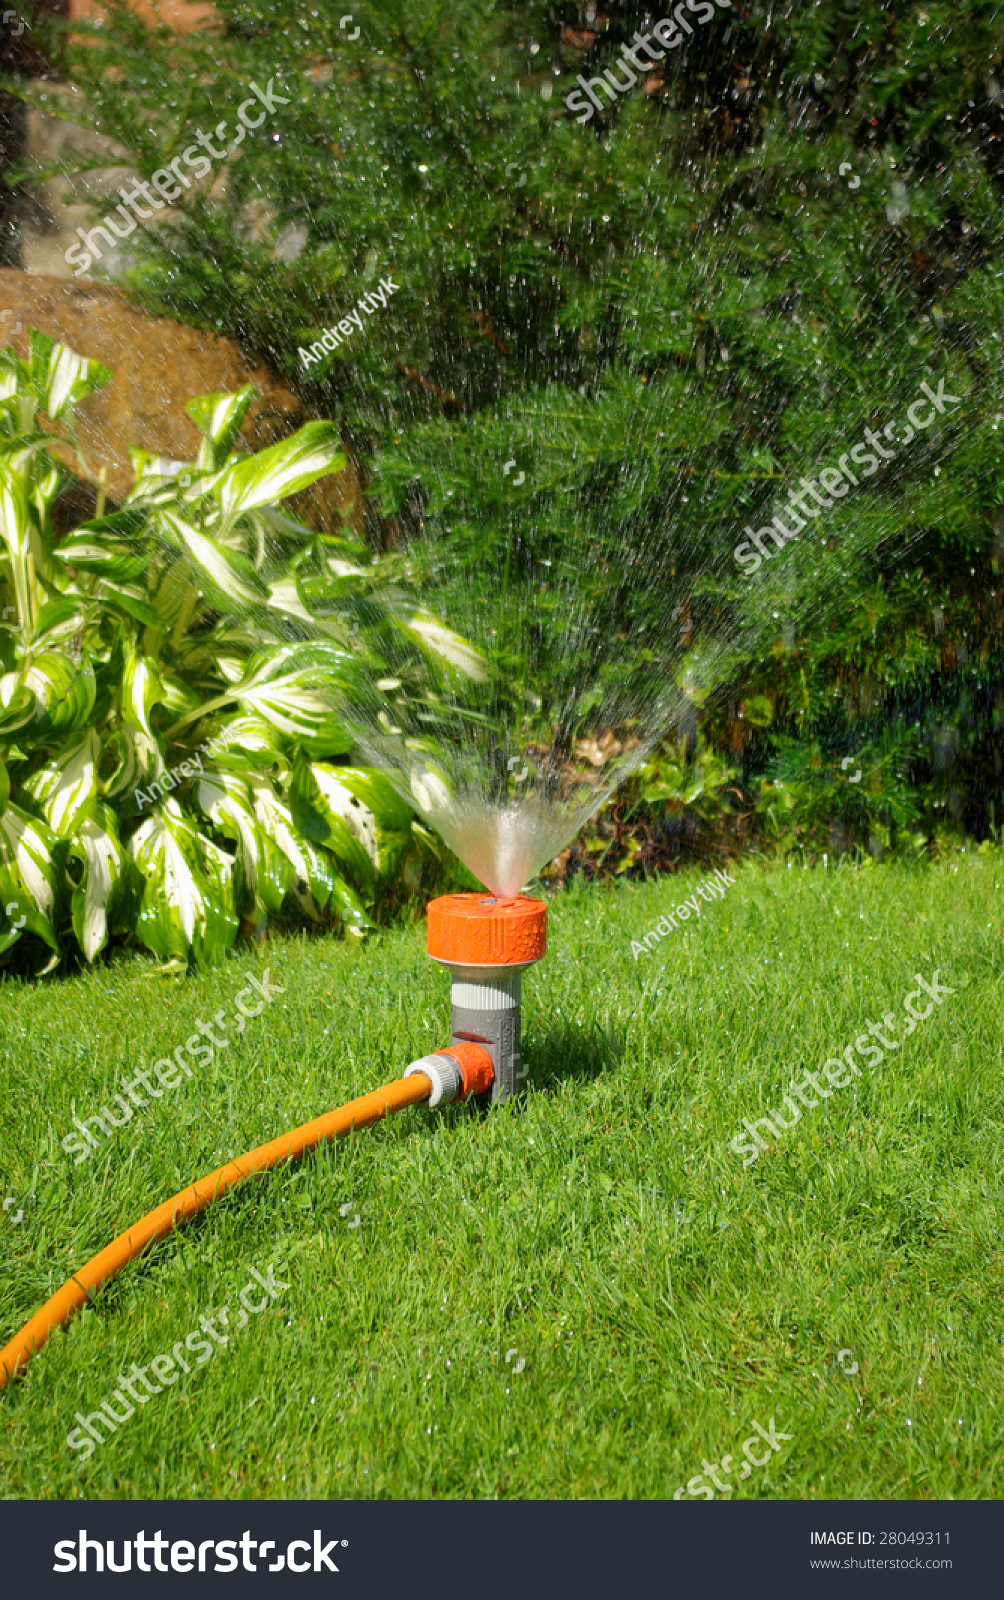 Backyard Garden Irrigation : Yellow sprinkler watering the backyard garden stock photo